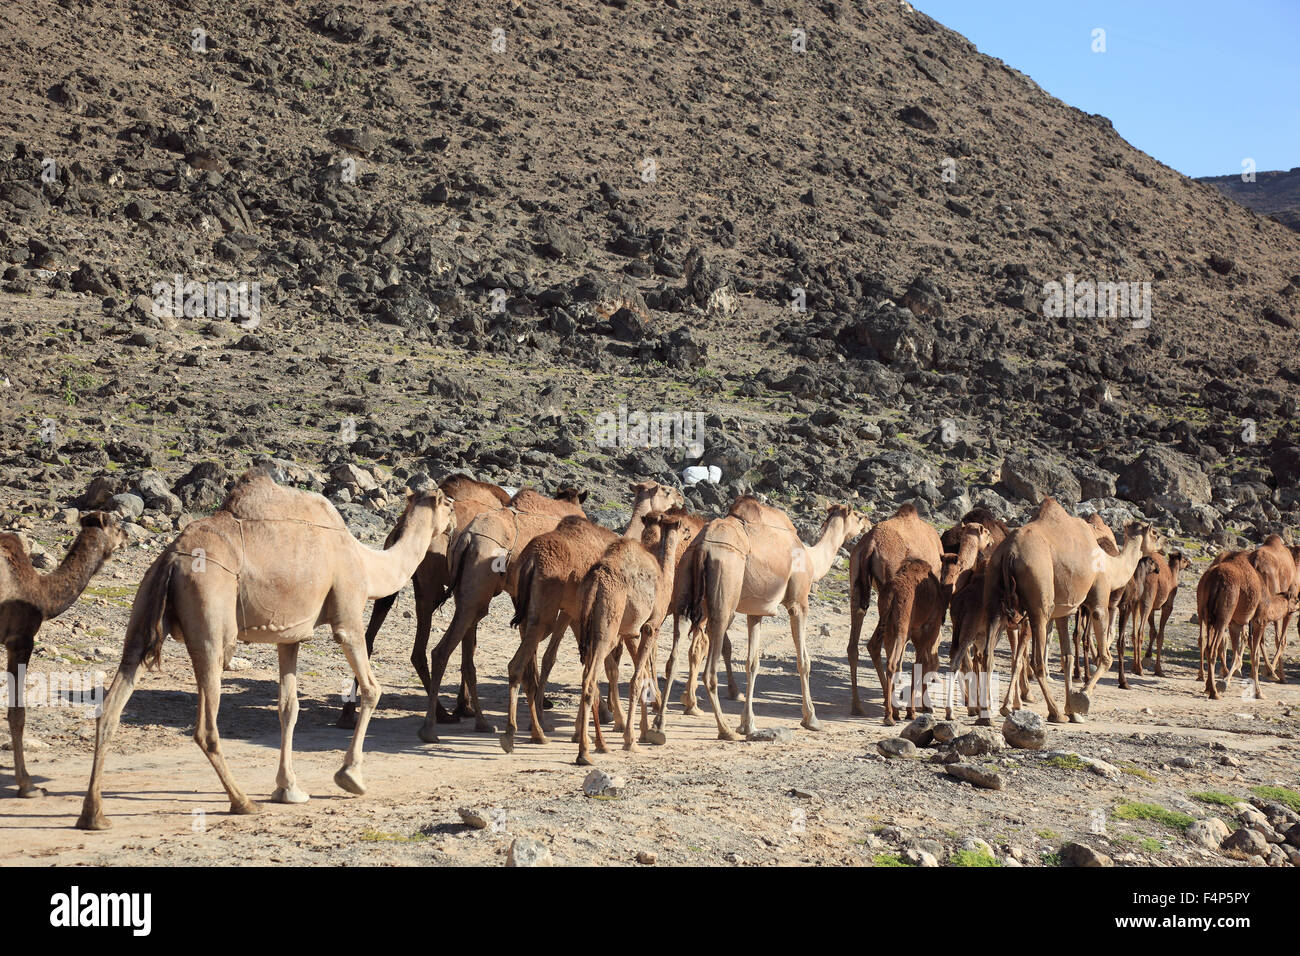 Camel cookers in the Dhofar region, Jabal Al Qamar, southern Oman - Stock Image